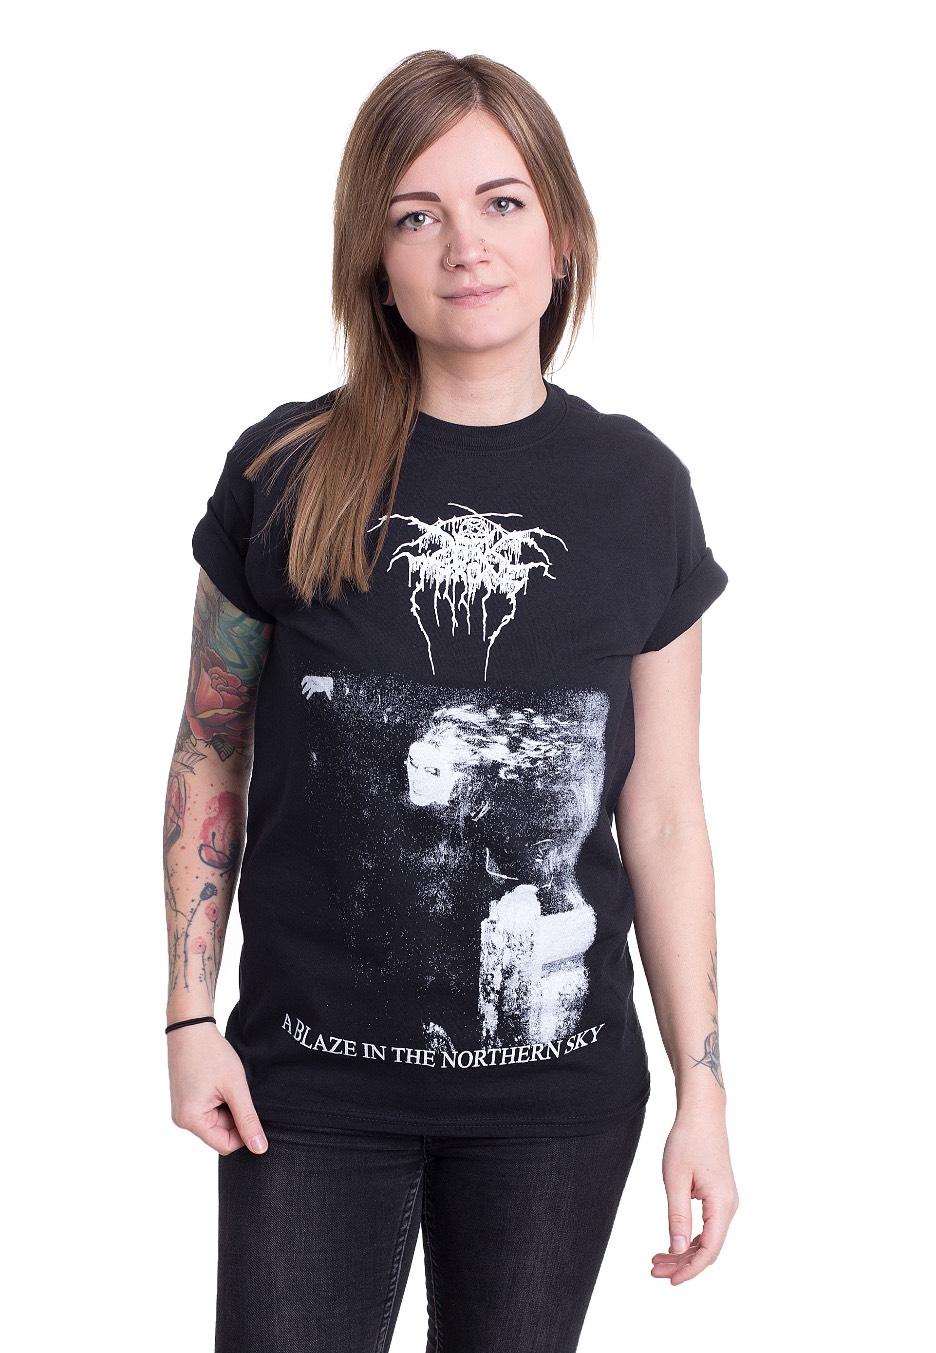 darkthrone a blaze in the northern sky tshirt